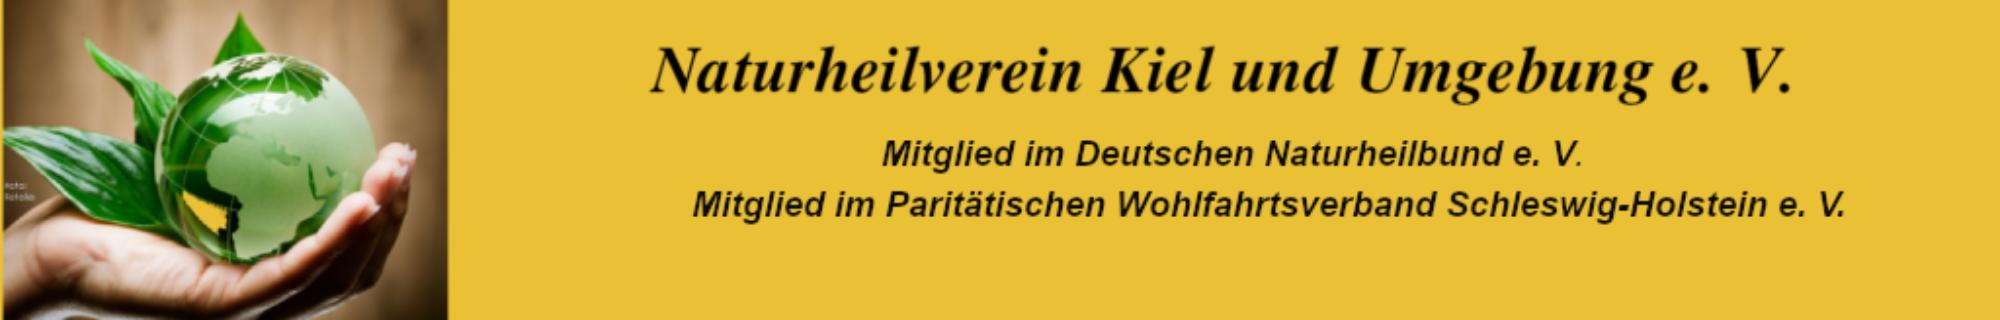 Naturheilverein Kiel und Umgebung e. V.